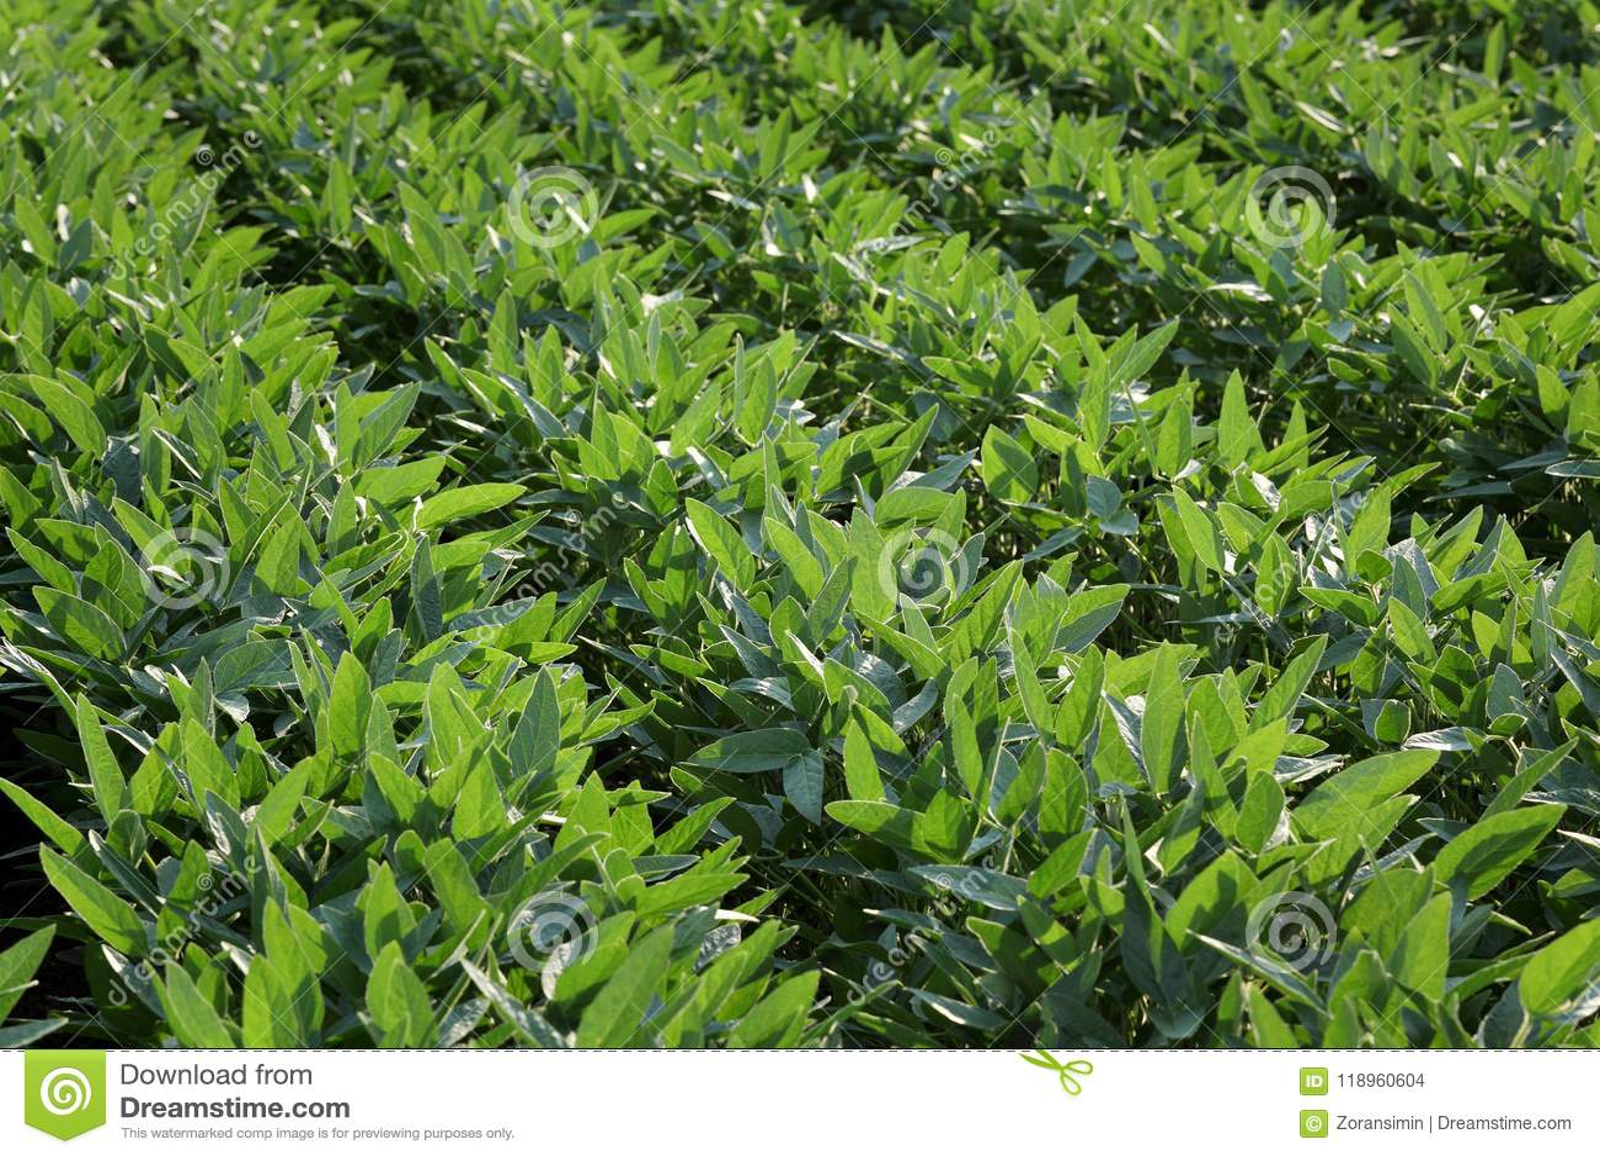 Green cultivated soybean plants in field